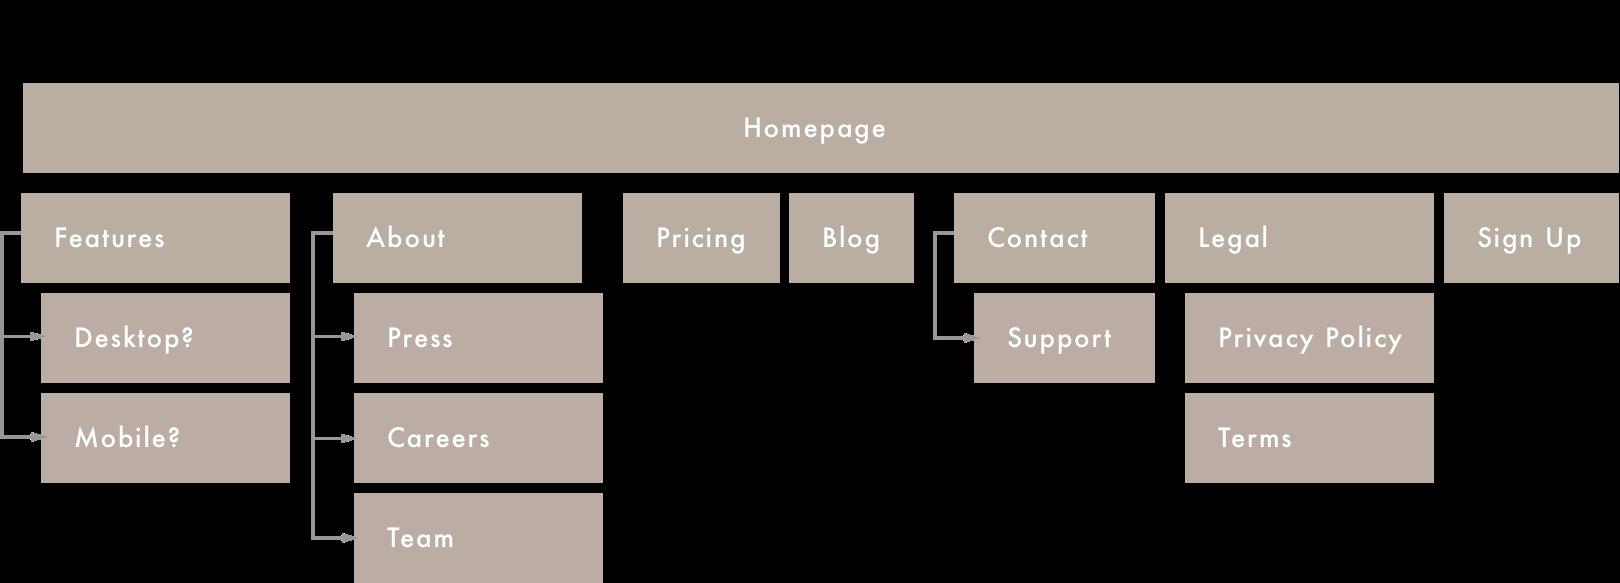 control-sitemap.png